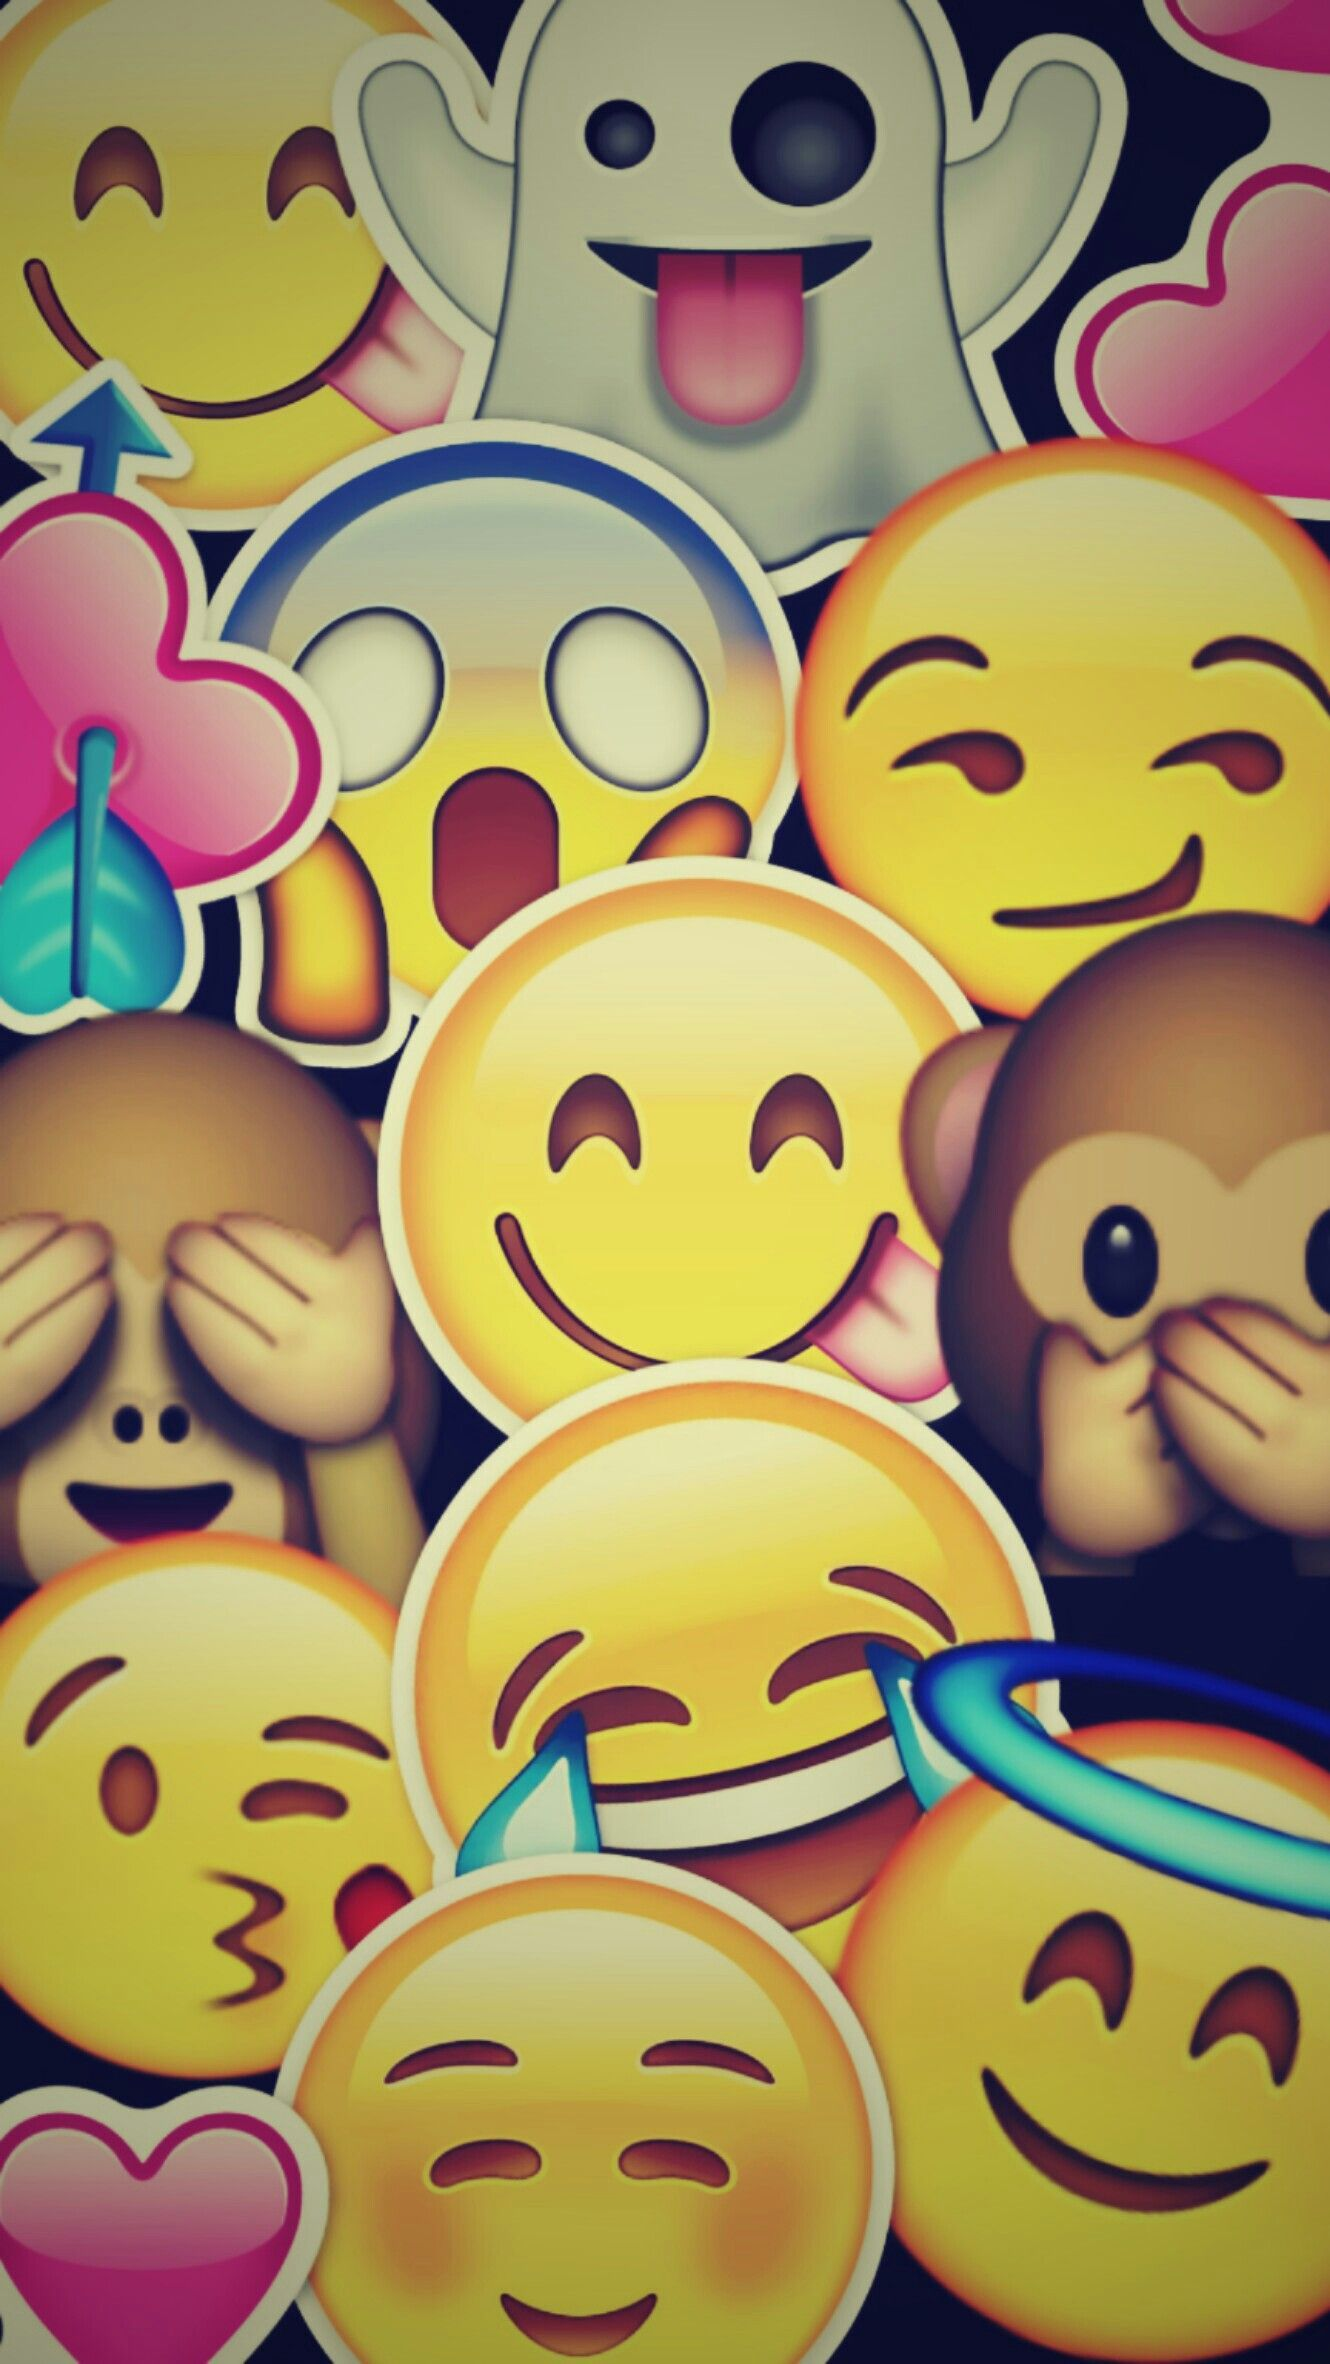 Emoji Background Wallpaper Iphone Background Iphonebackground